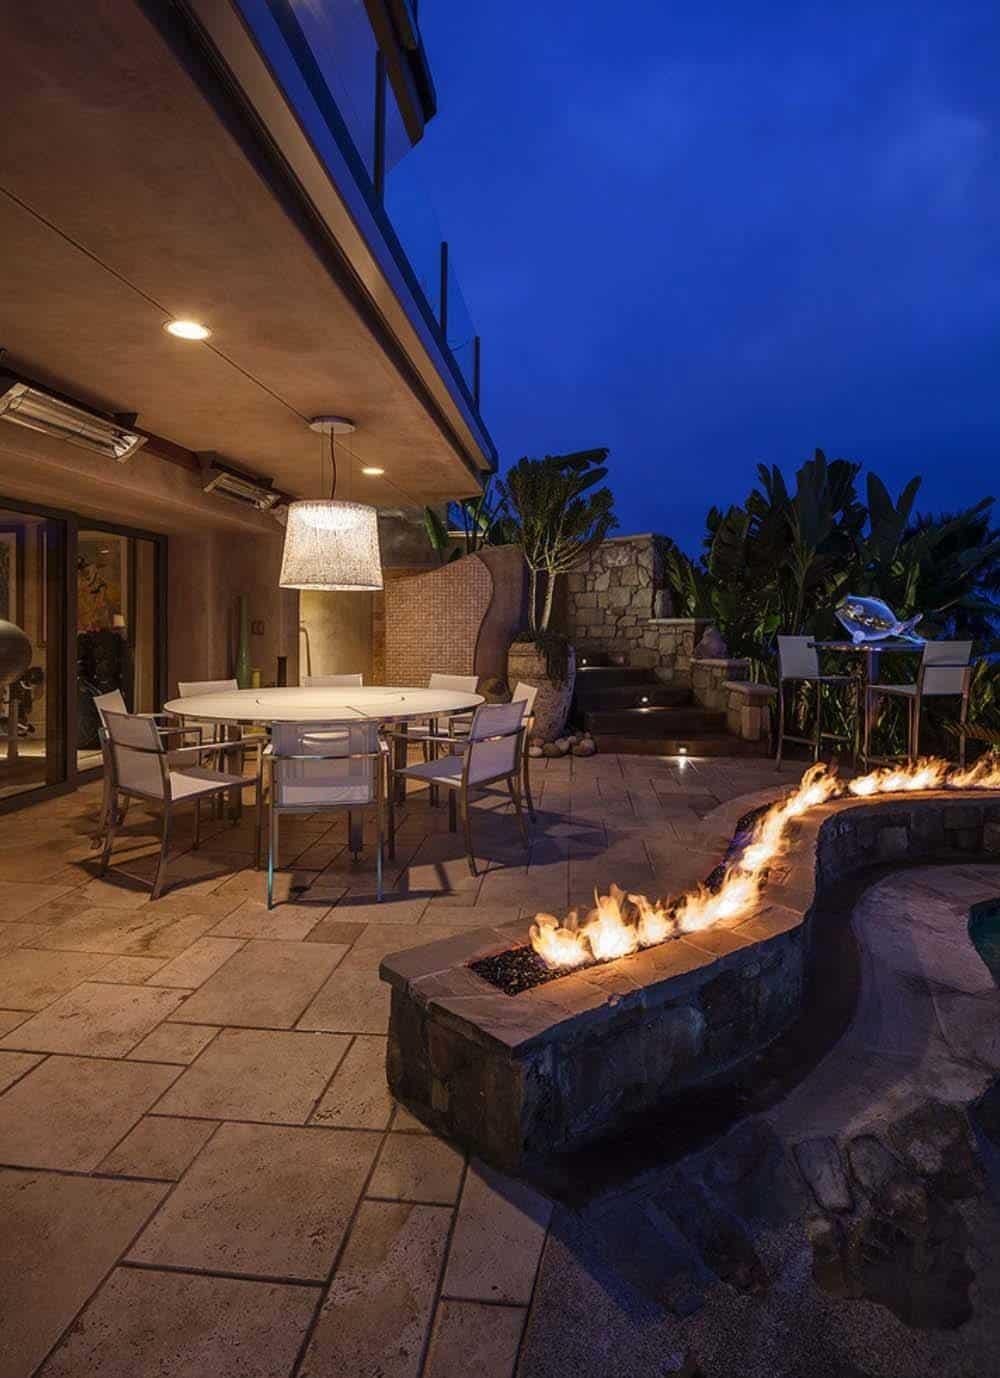 35 Modern outdoor patio designs that will blow your mind on Modern Garden Patio Ideas id=45997